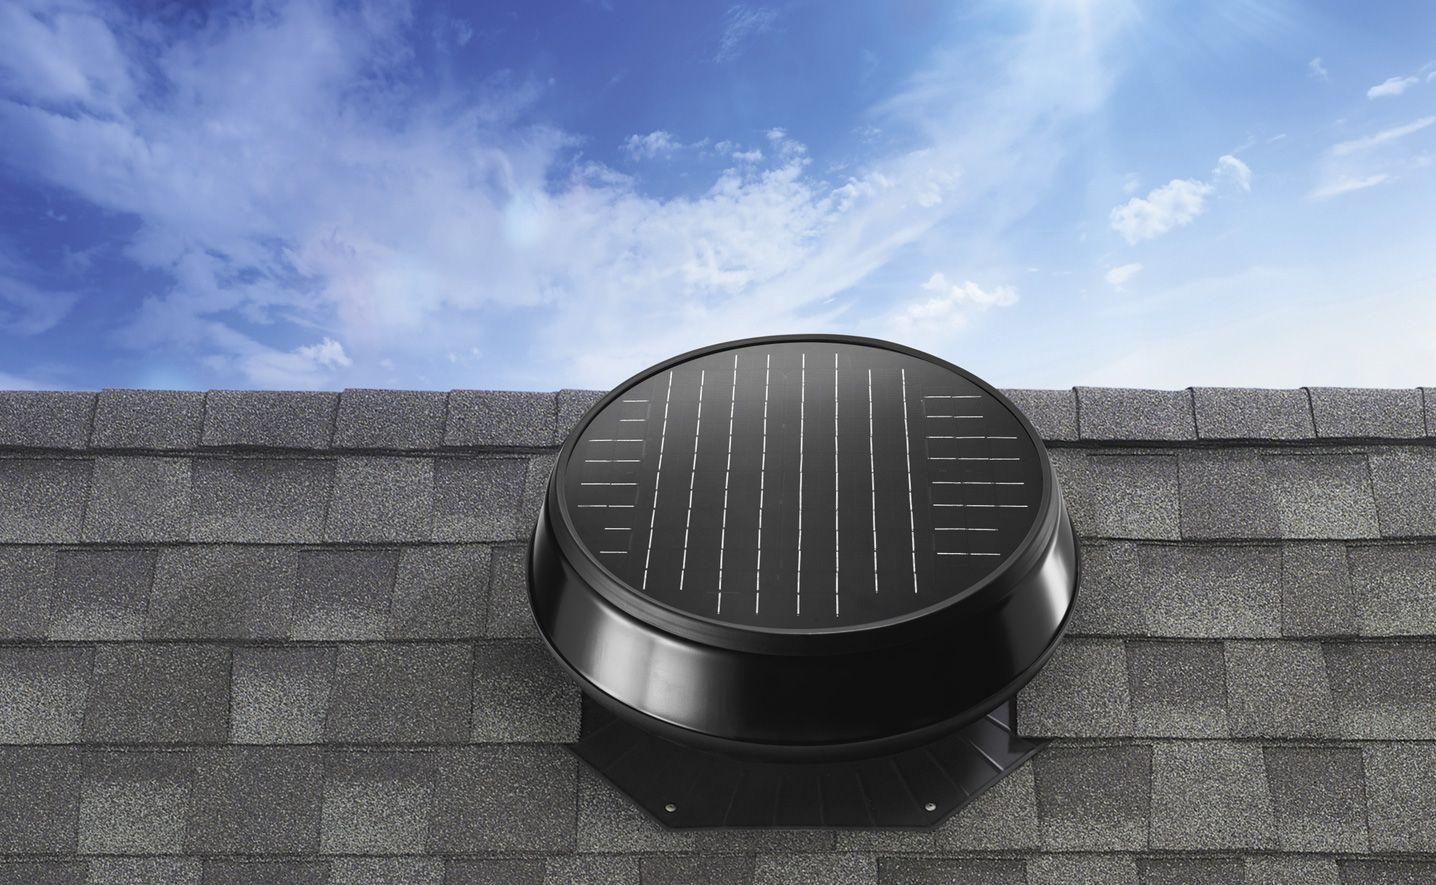 Solar Attic Fans 3 Best Solar Powered Attic Fans In 2020 Solar Powered Attic Fan Solar Roof Vents Solar Attic Fan